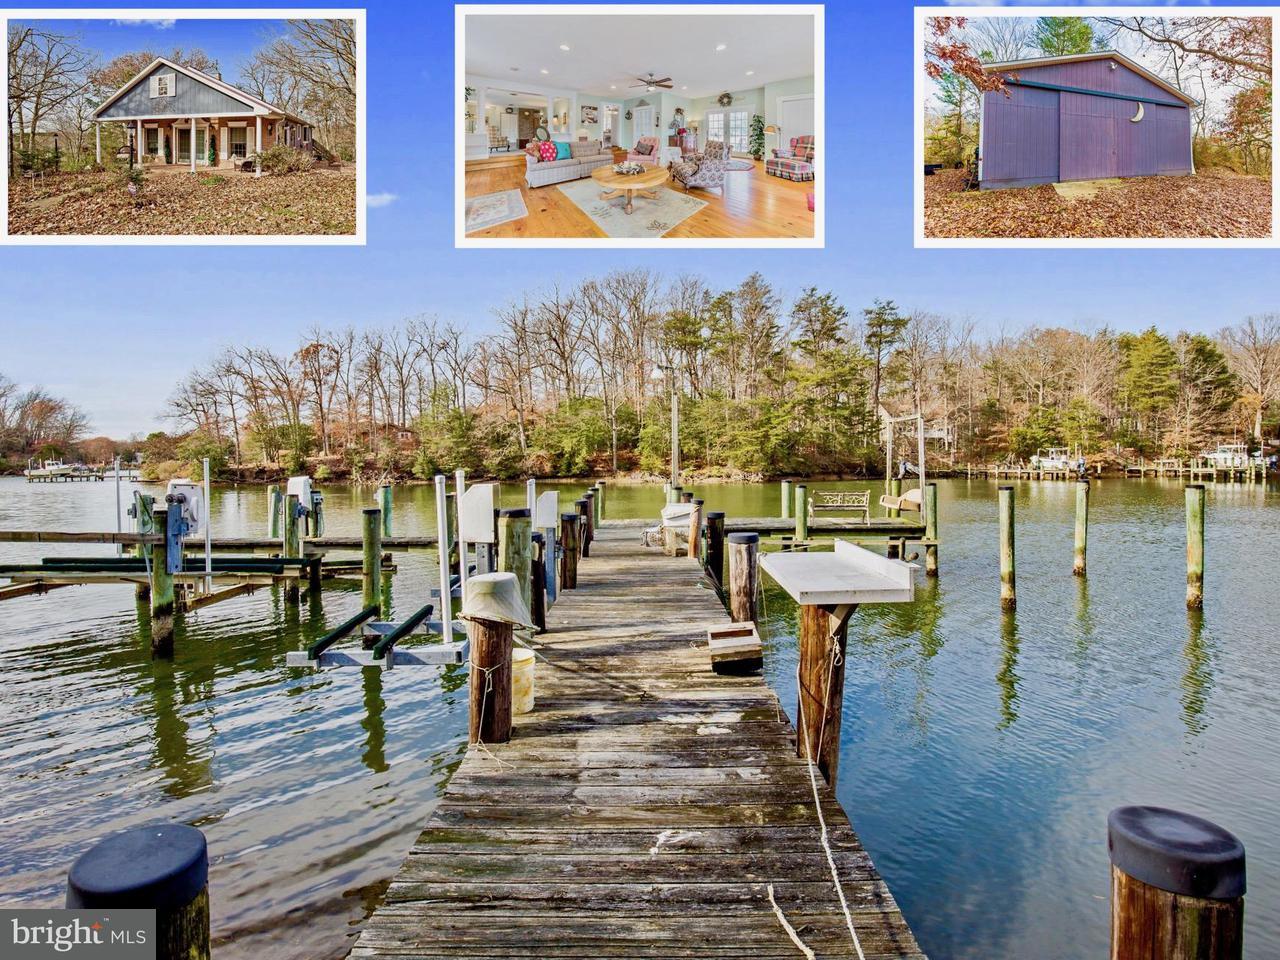 Single Family Home for Sale at 525 Garner Road 525 Garner Road Lusby, Maryland 20657 United States